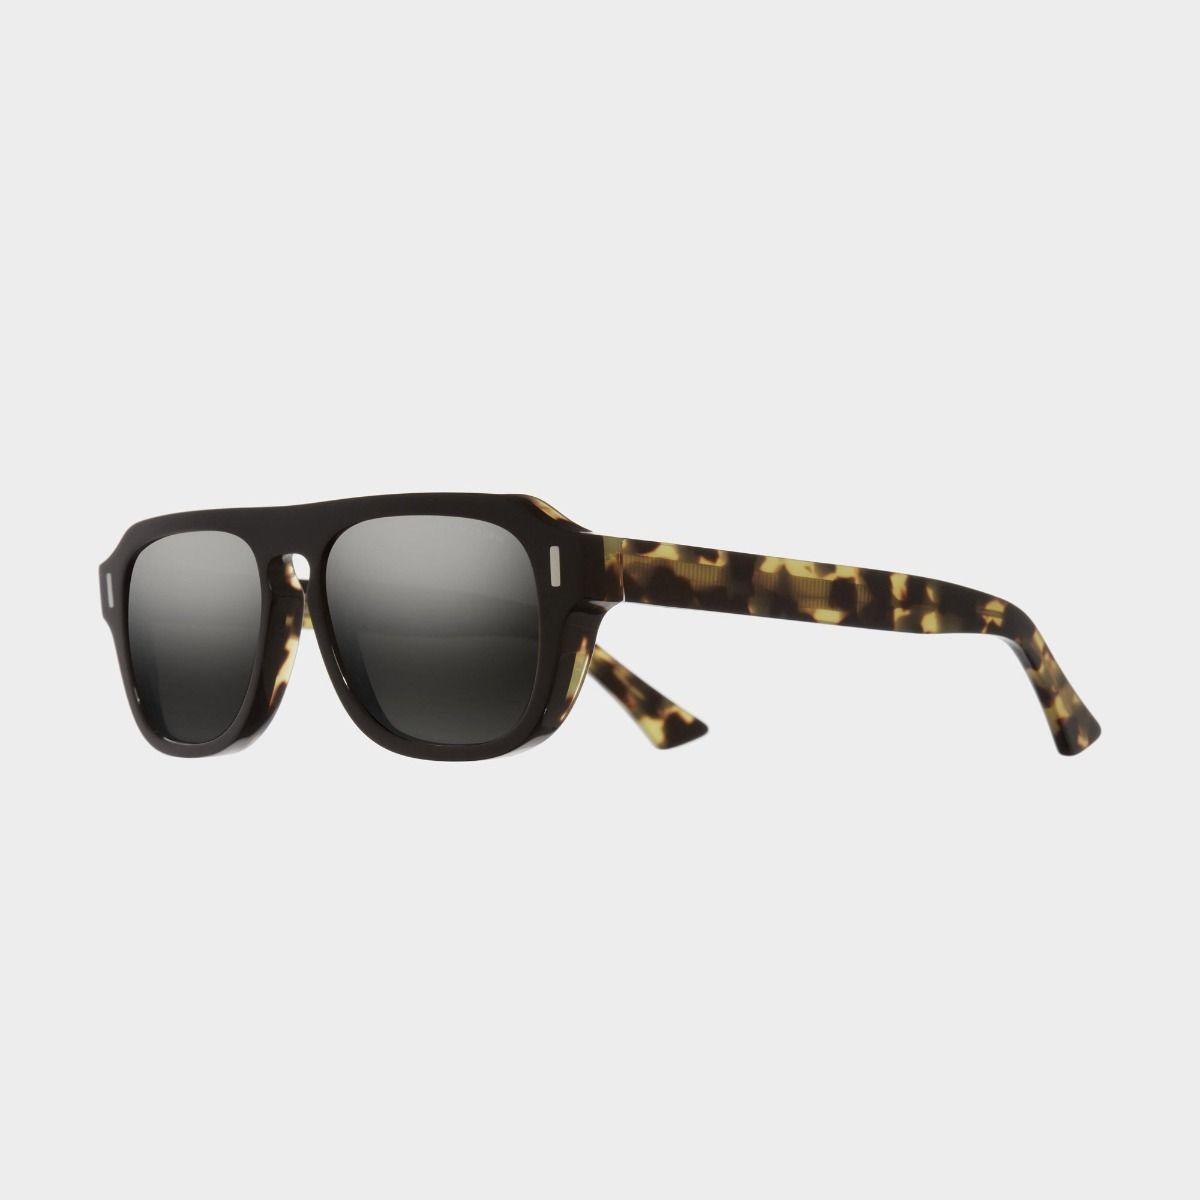 1319 Aviator Sunglasses-Black on Camo